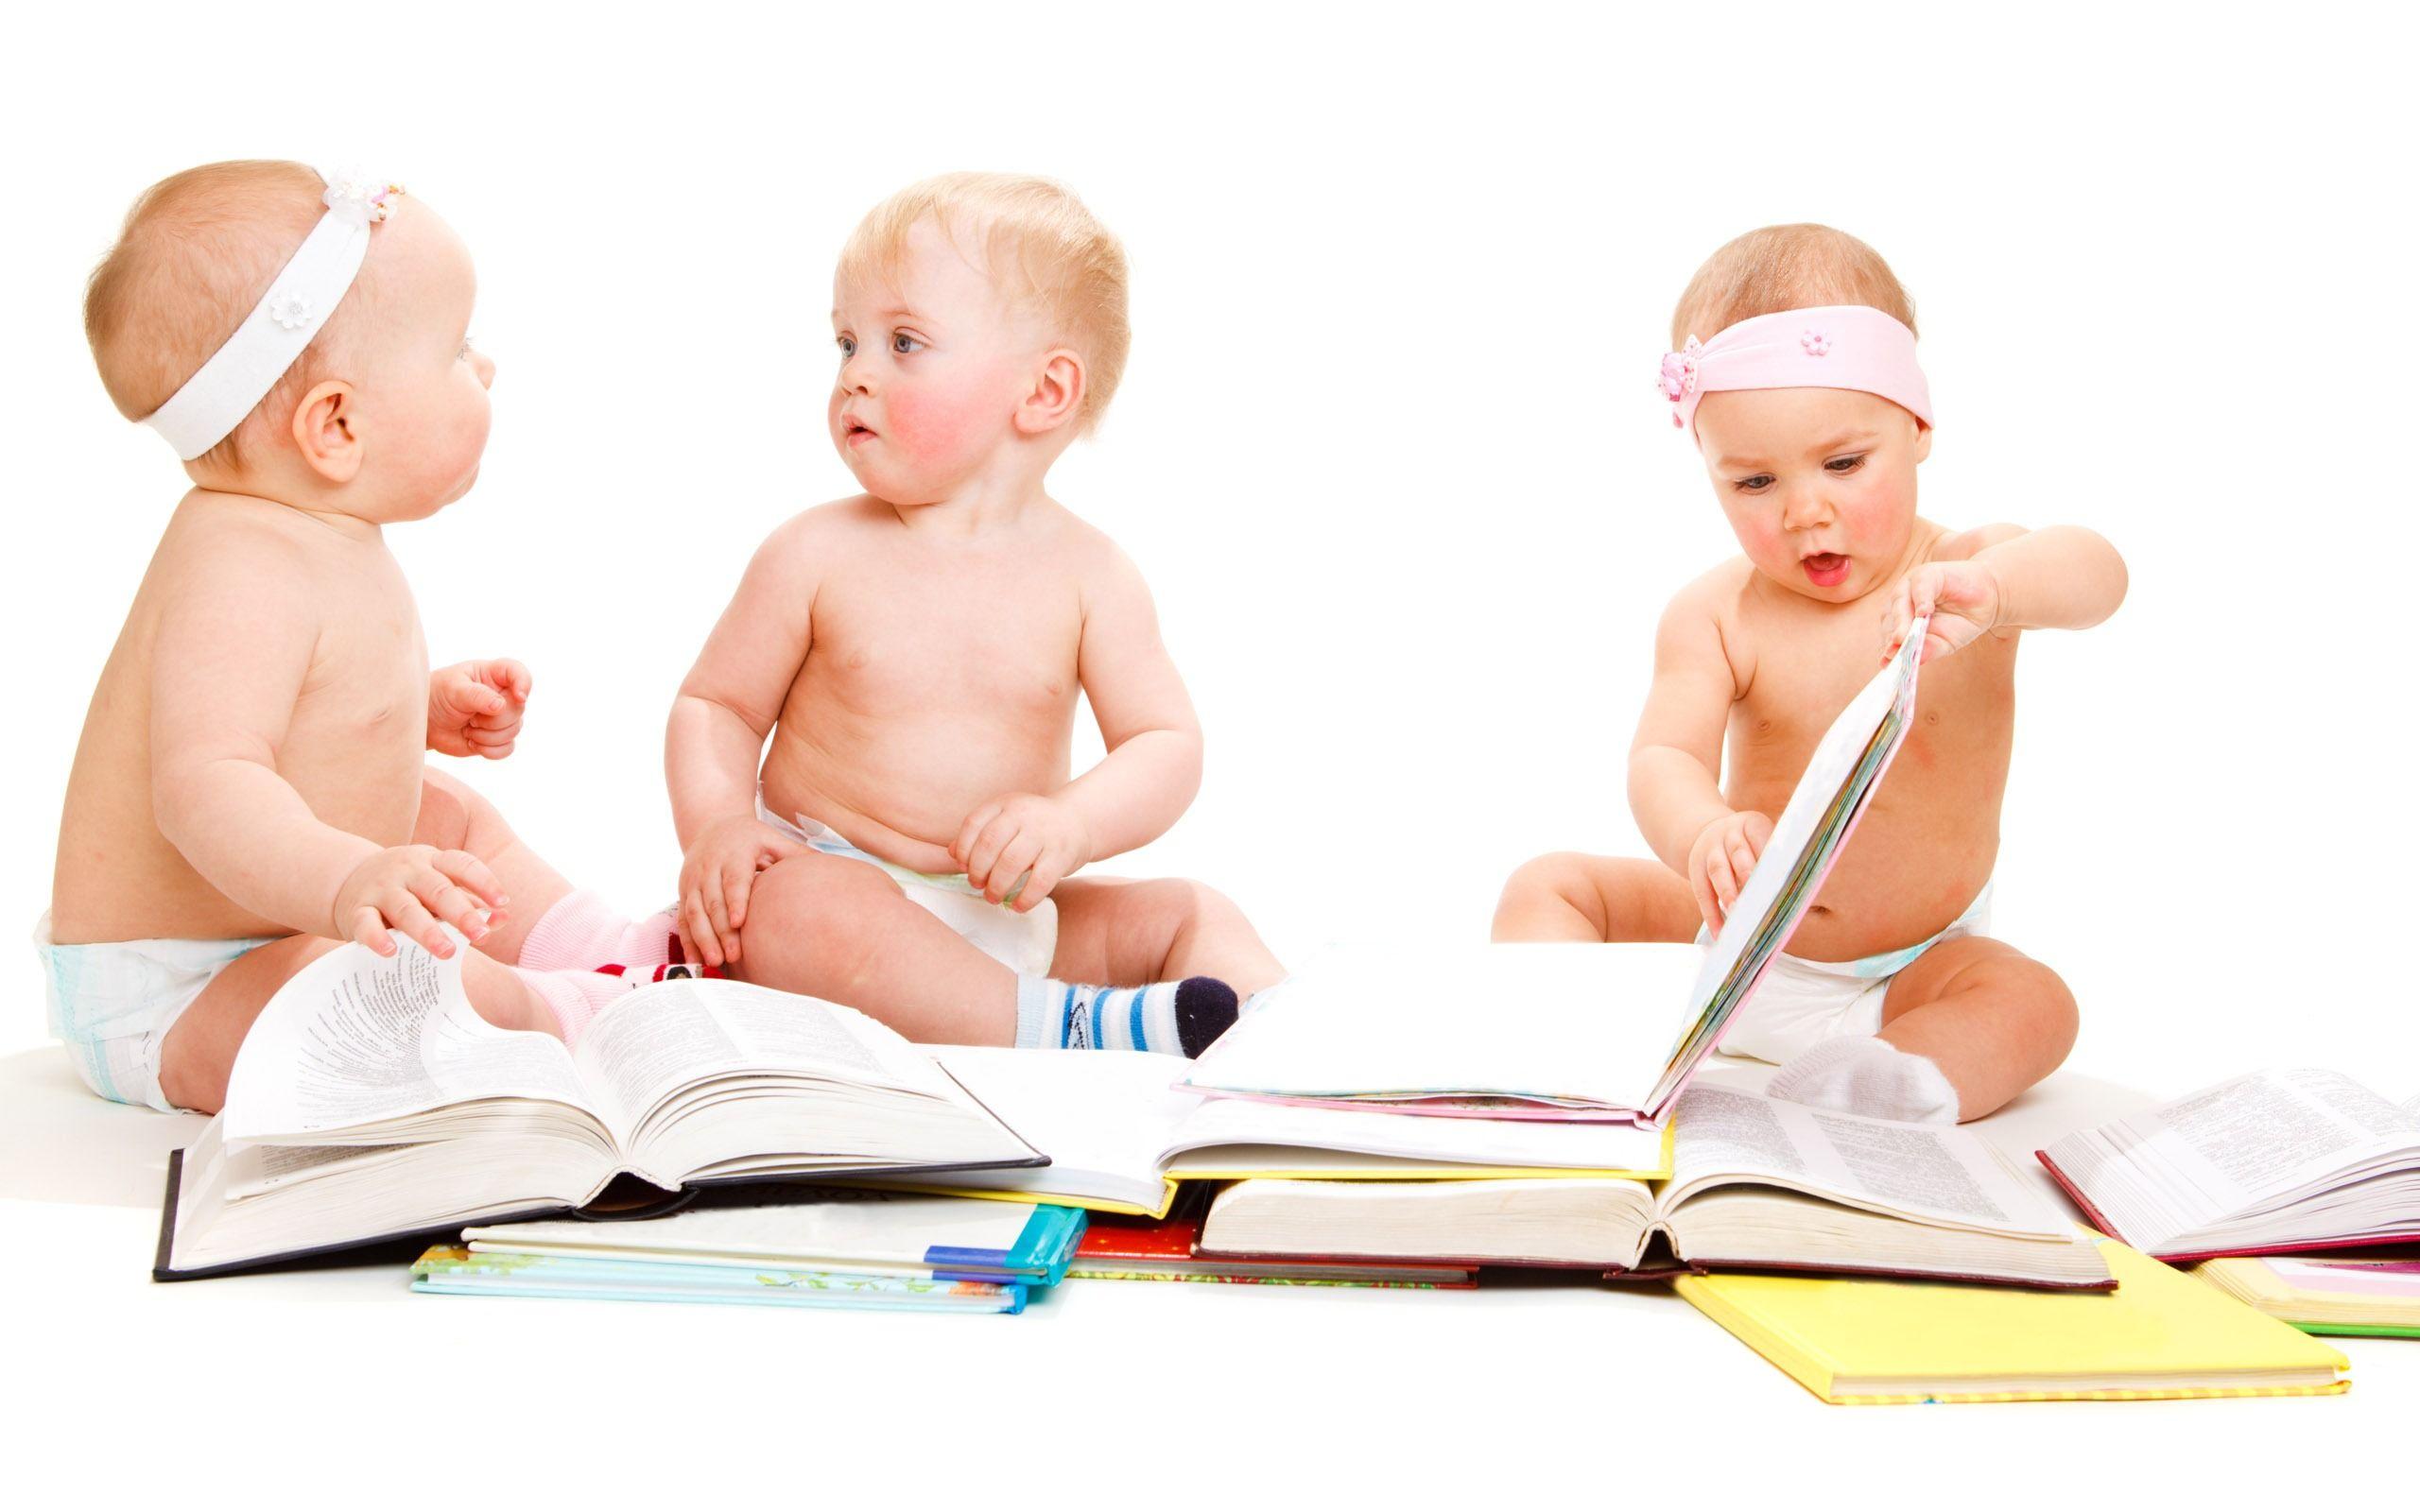 Cute babies and books widescreen wallpaper wide wallpapers net